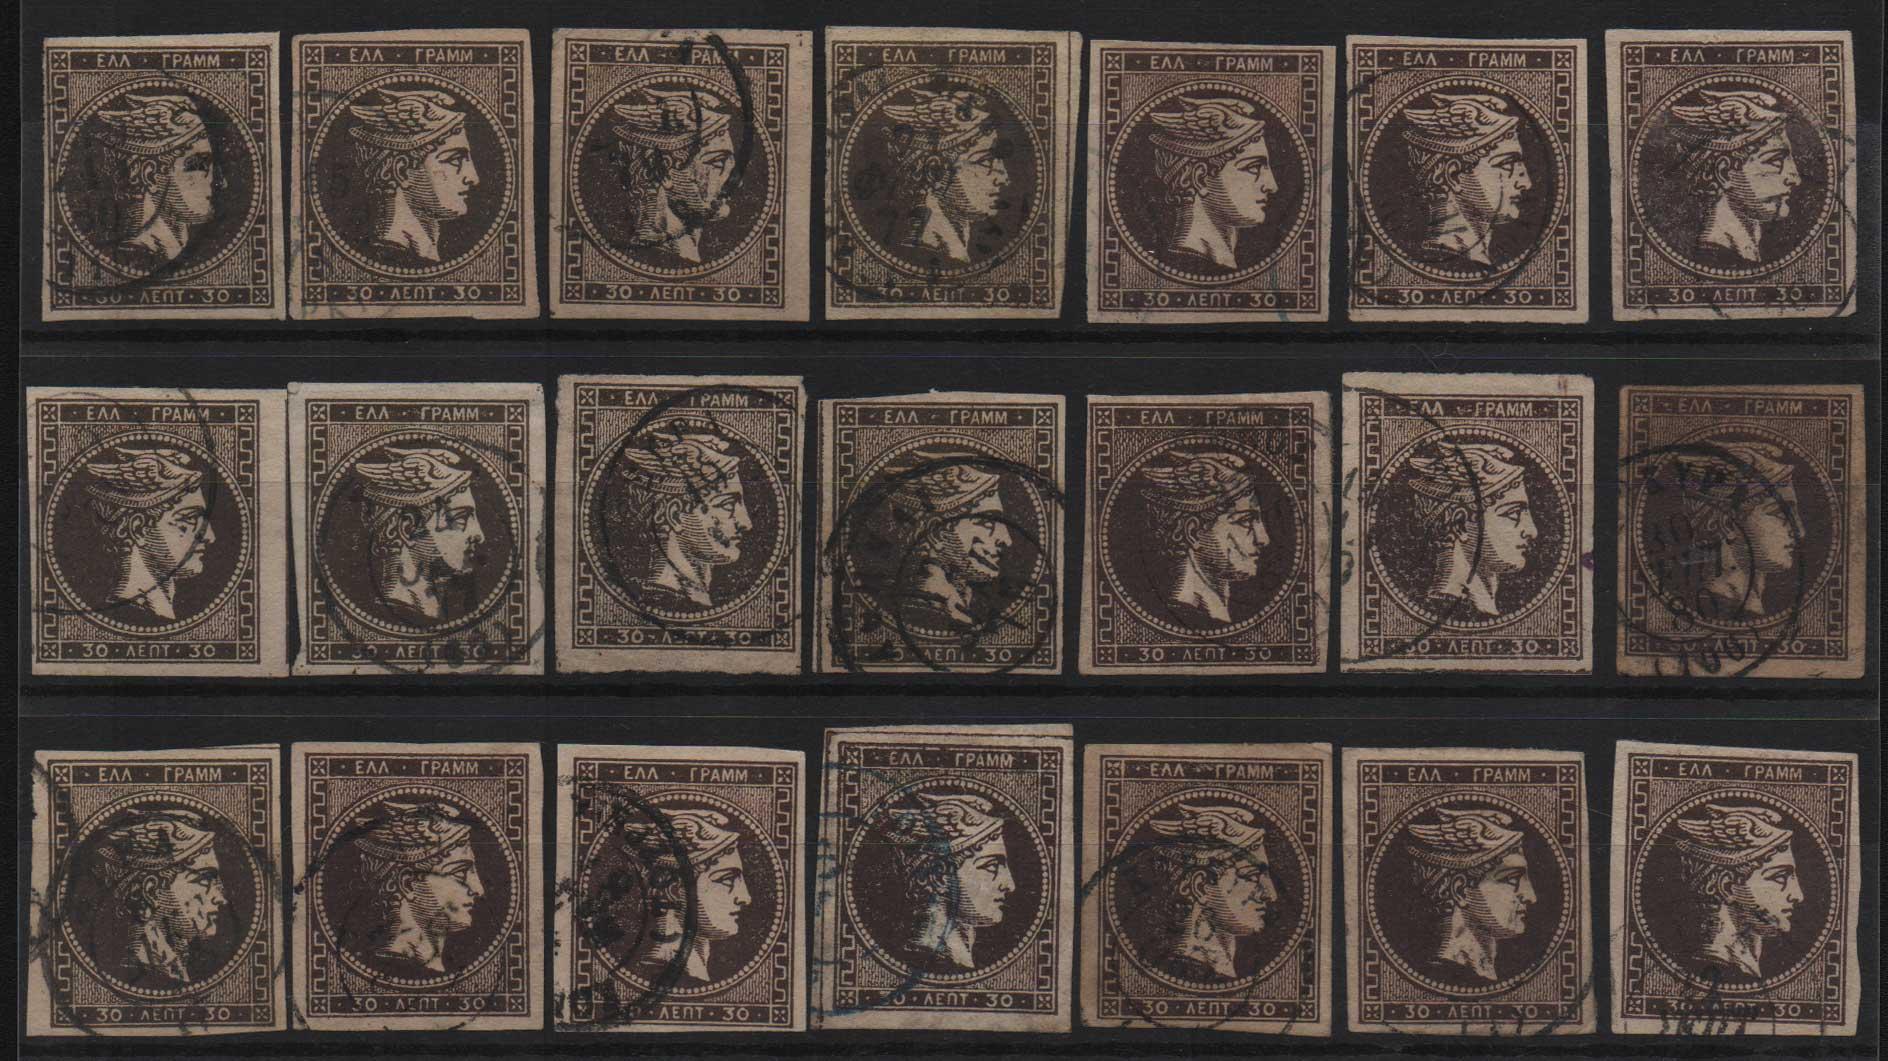 Lot 15 - -  LARGE HERMES HEAD large hermes head -  Athens Auctions Public Auction 71 General Stamp Sale